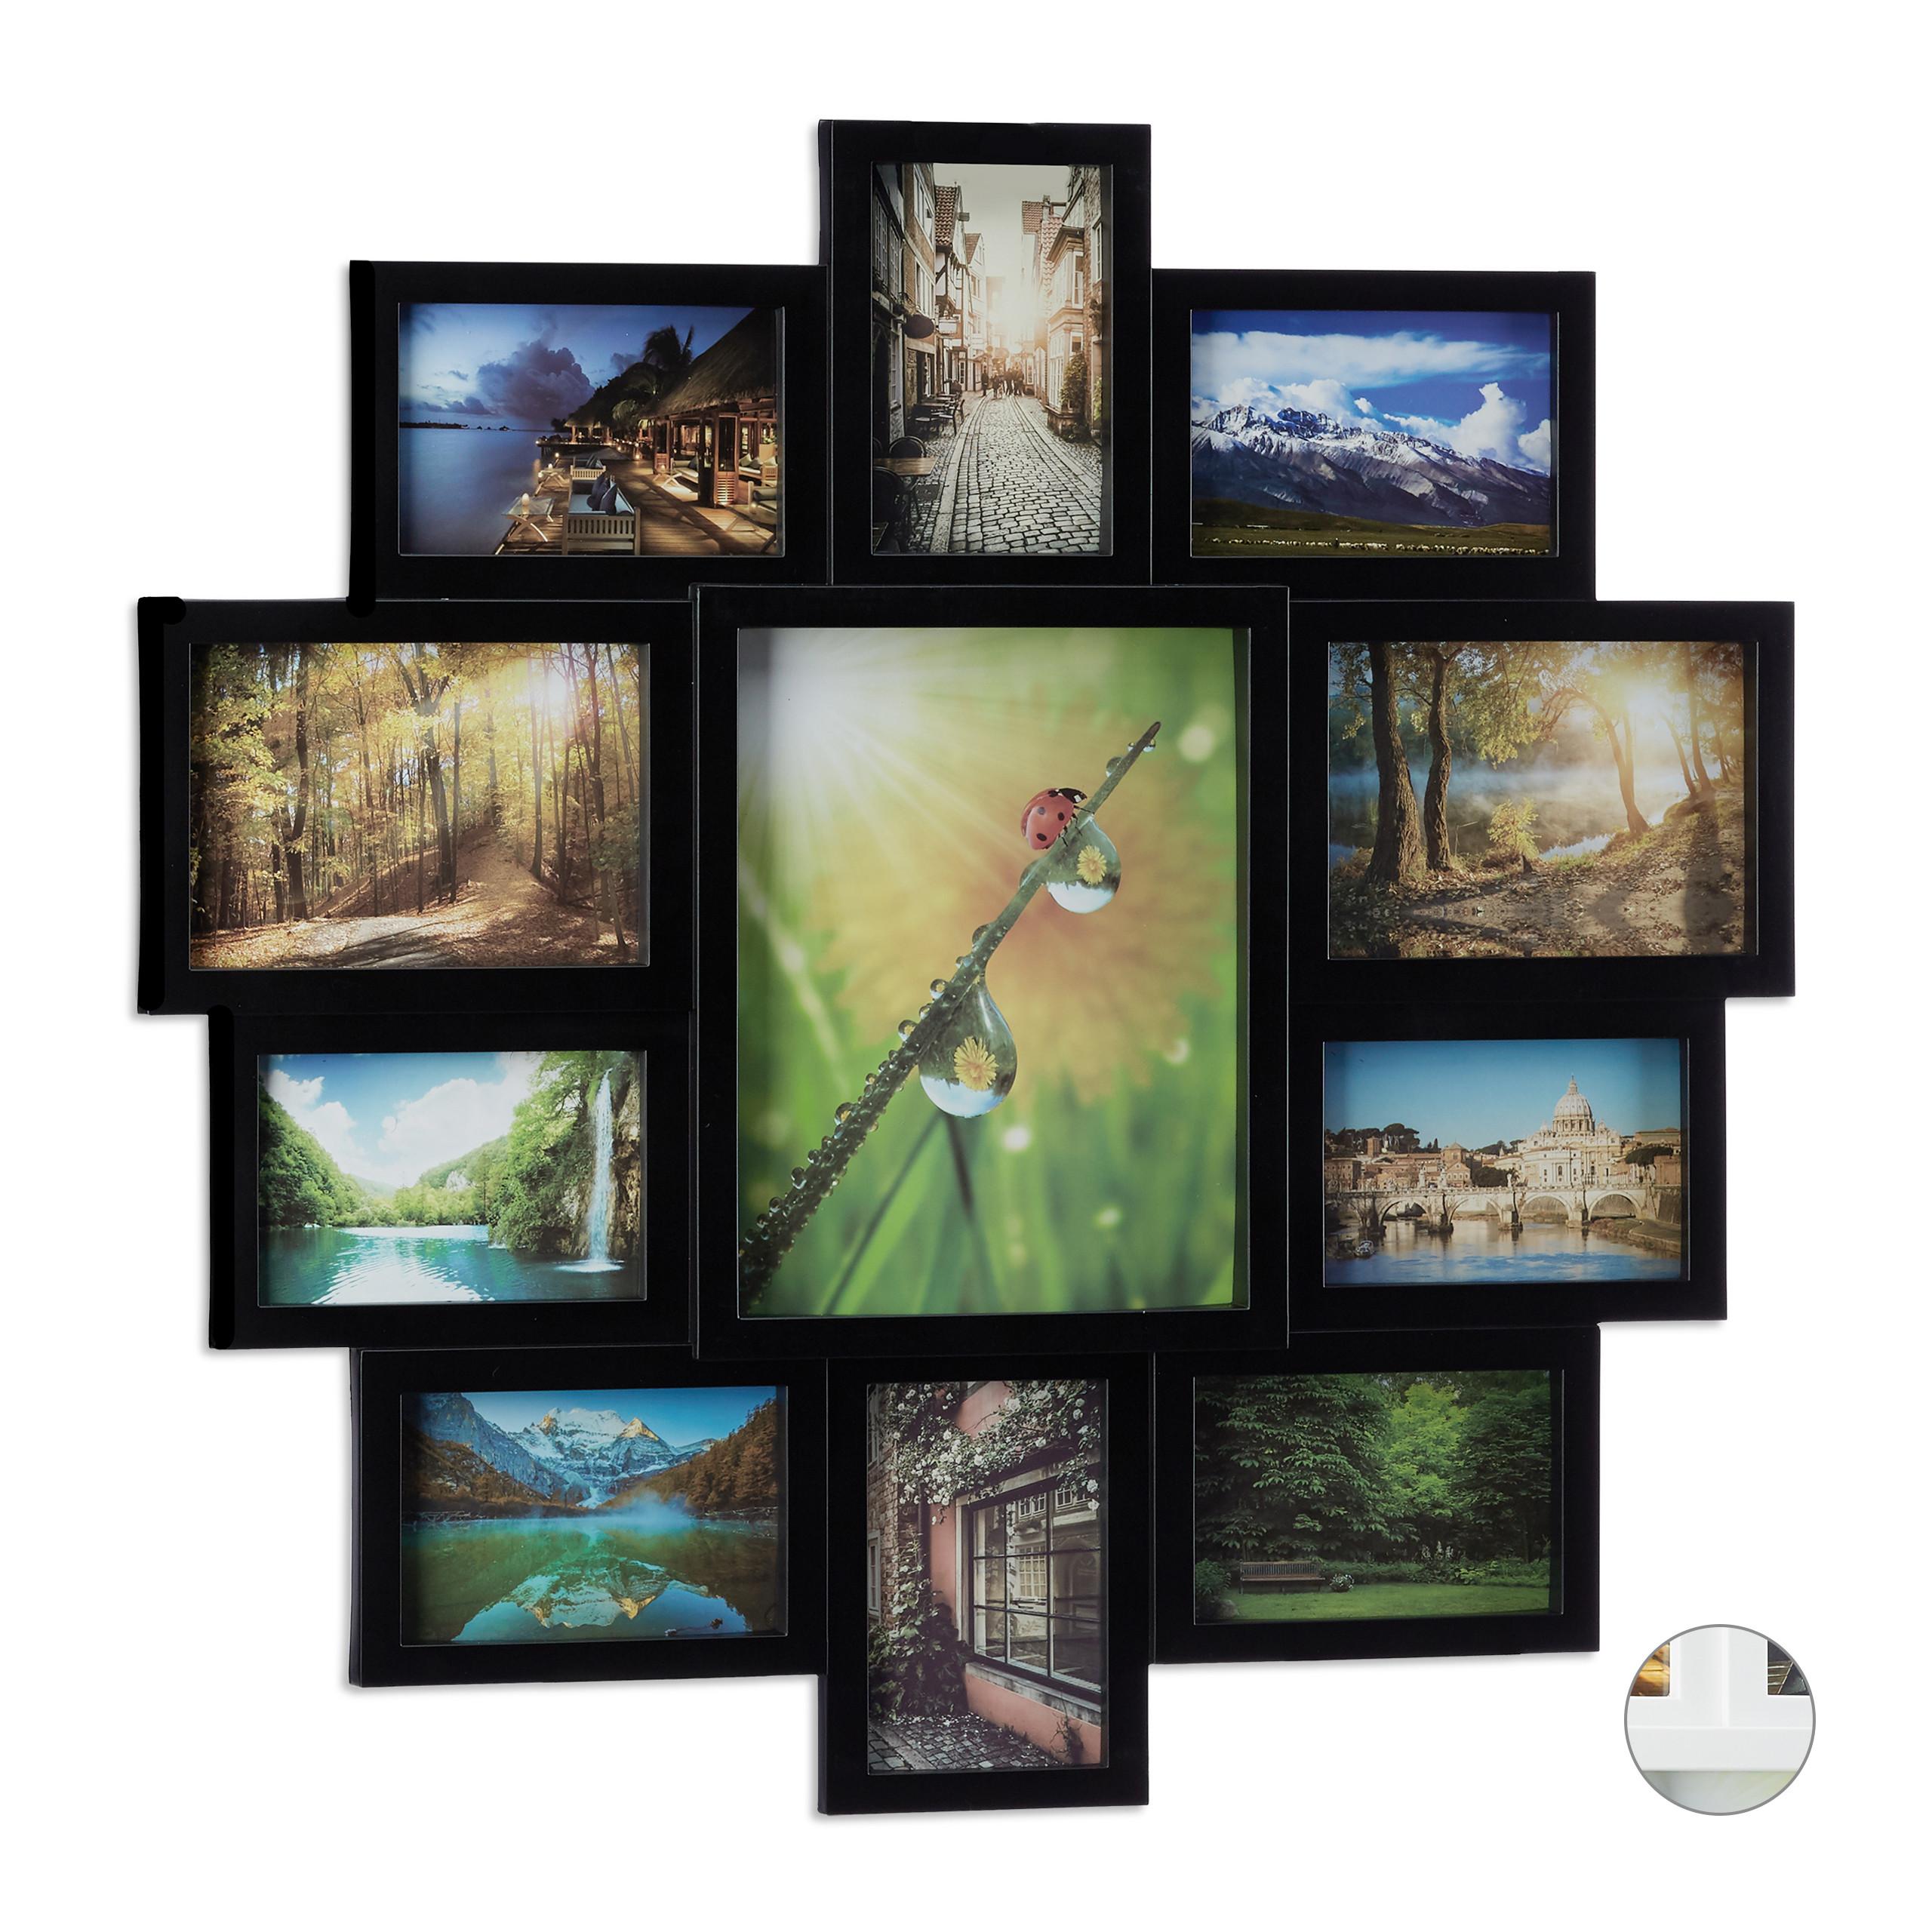 bilderrahmen collage 11 fotos bildergalerie fotocollage